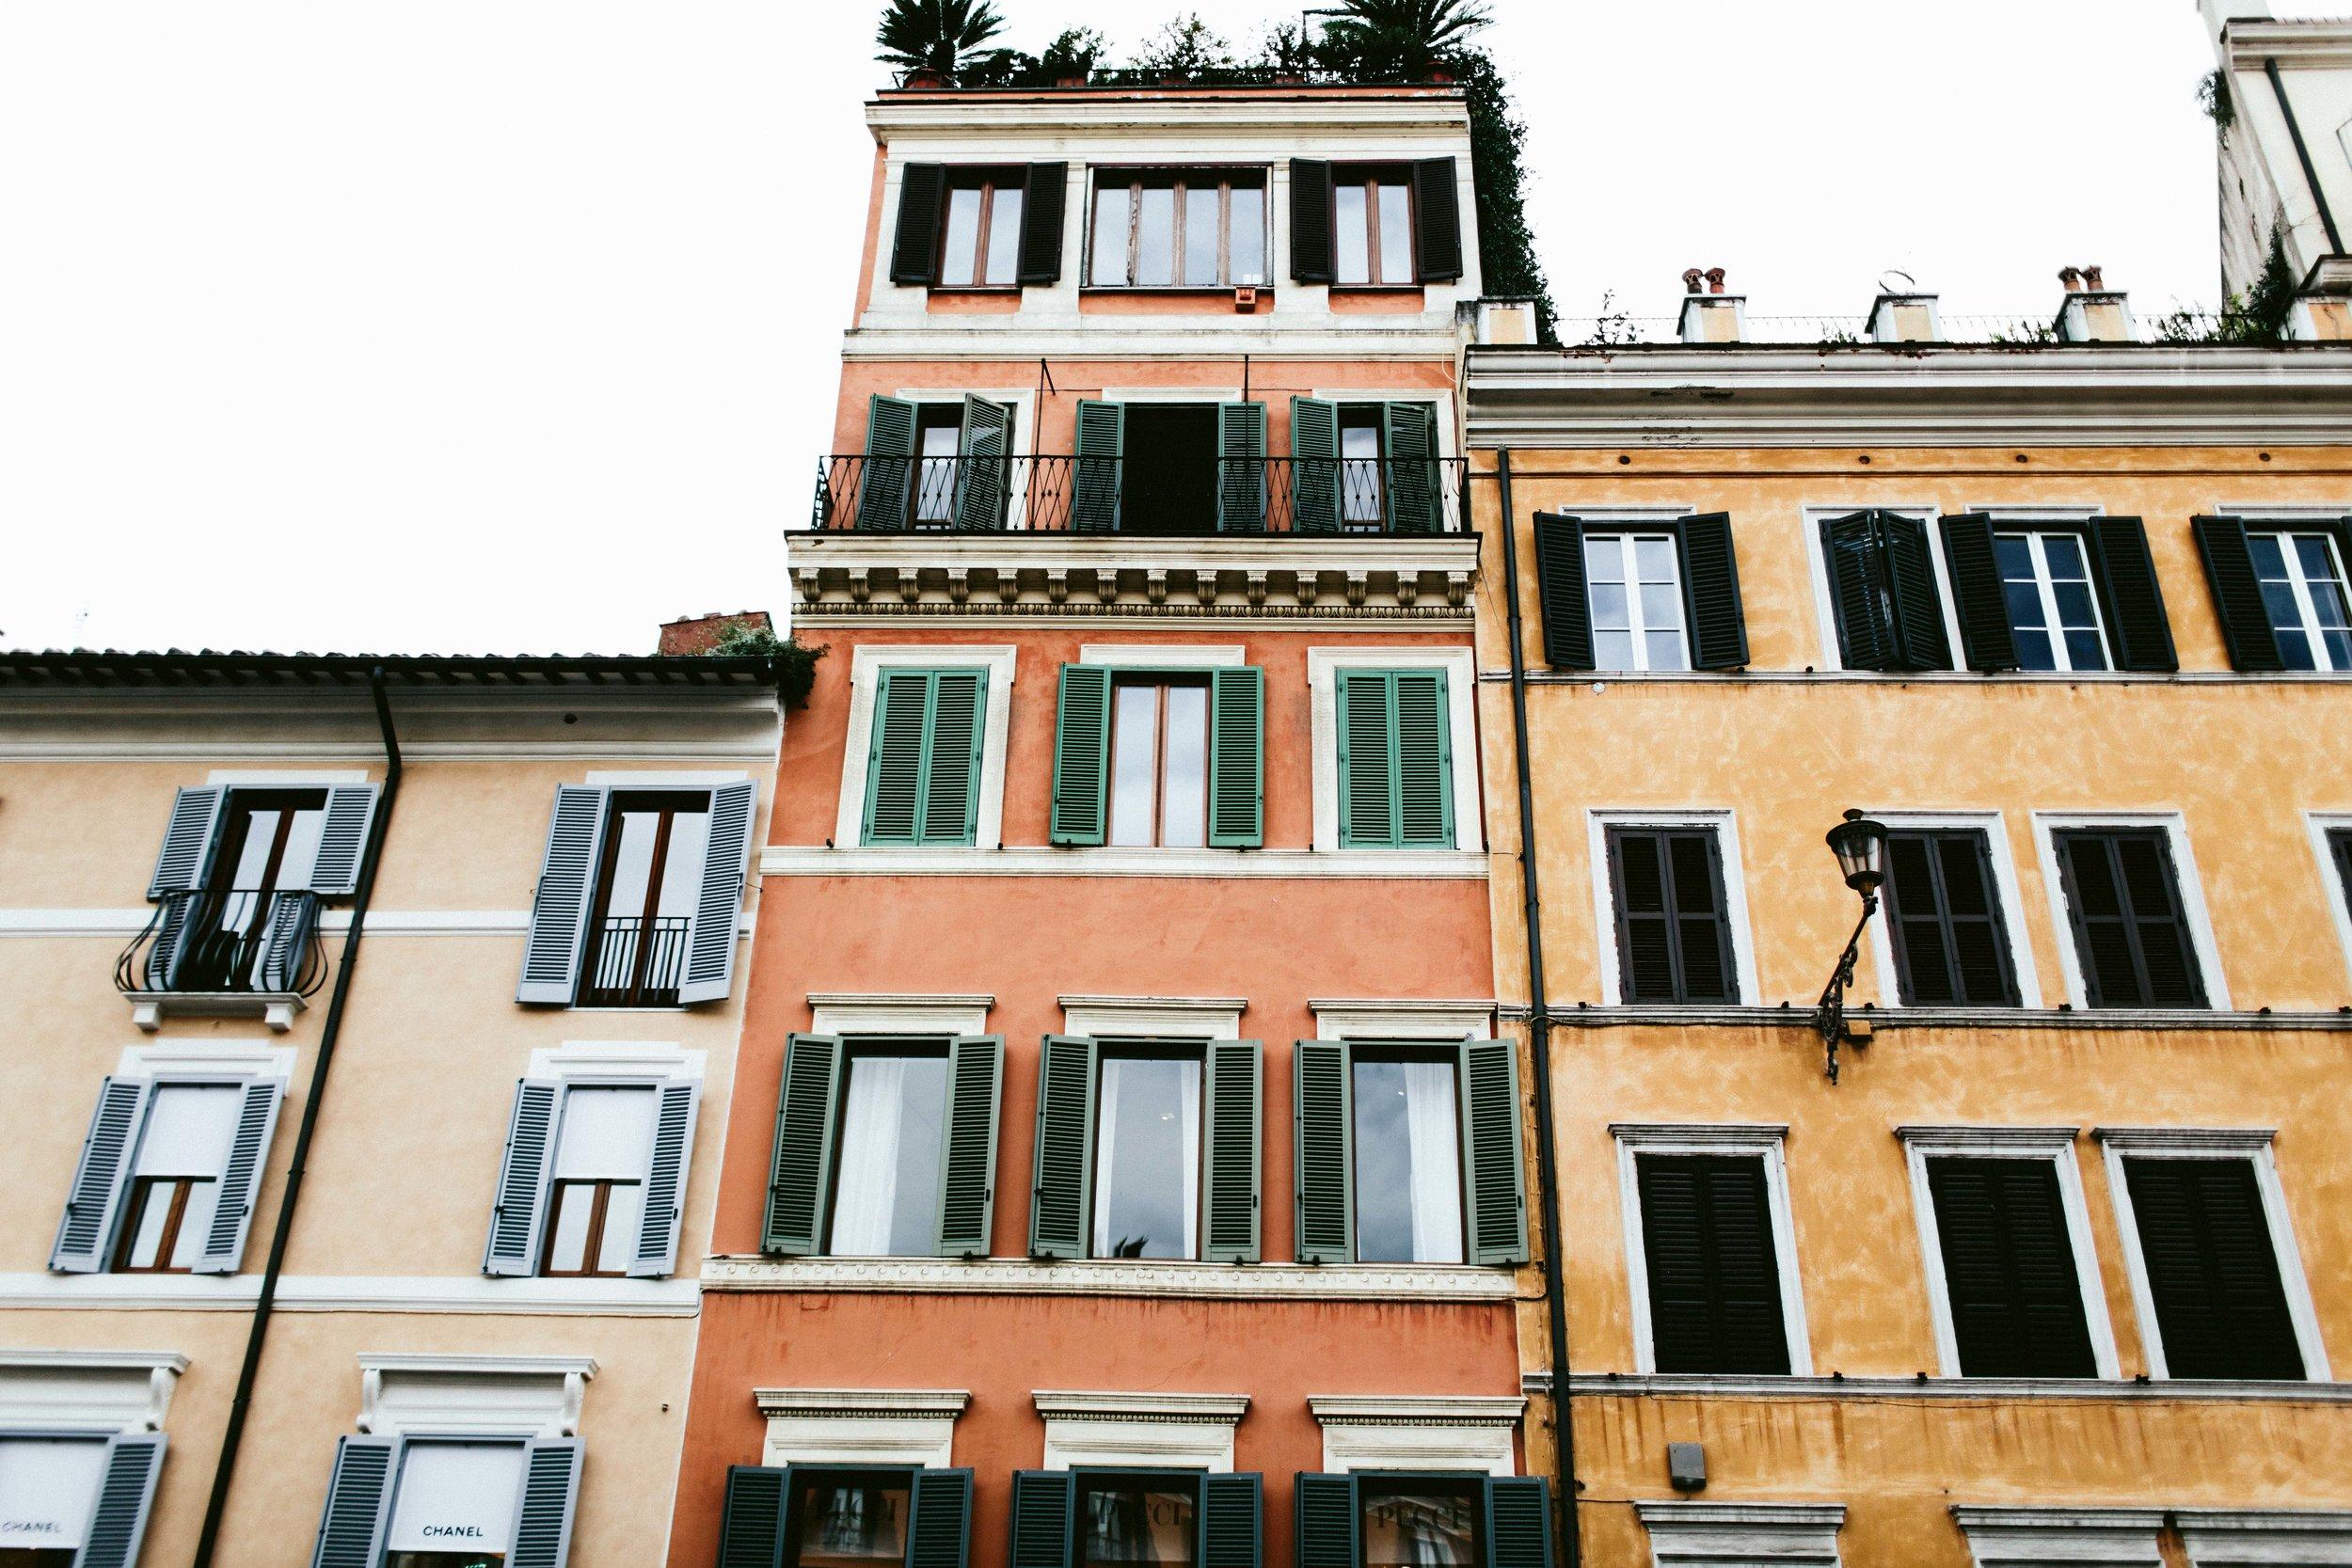 ITALY2015-358-14.jpg